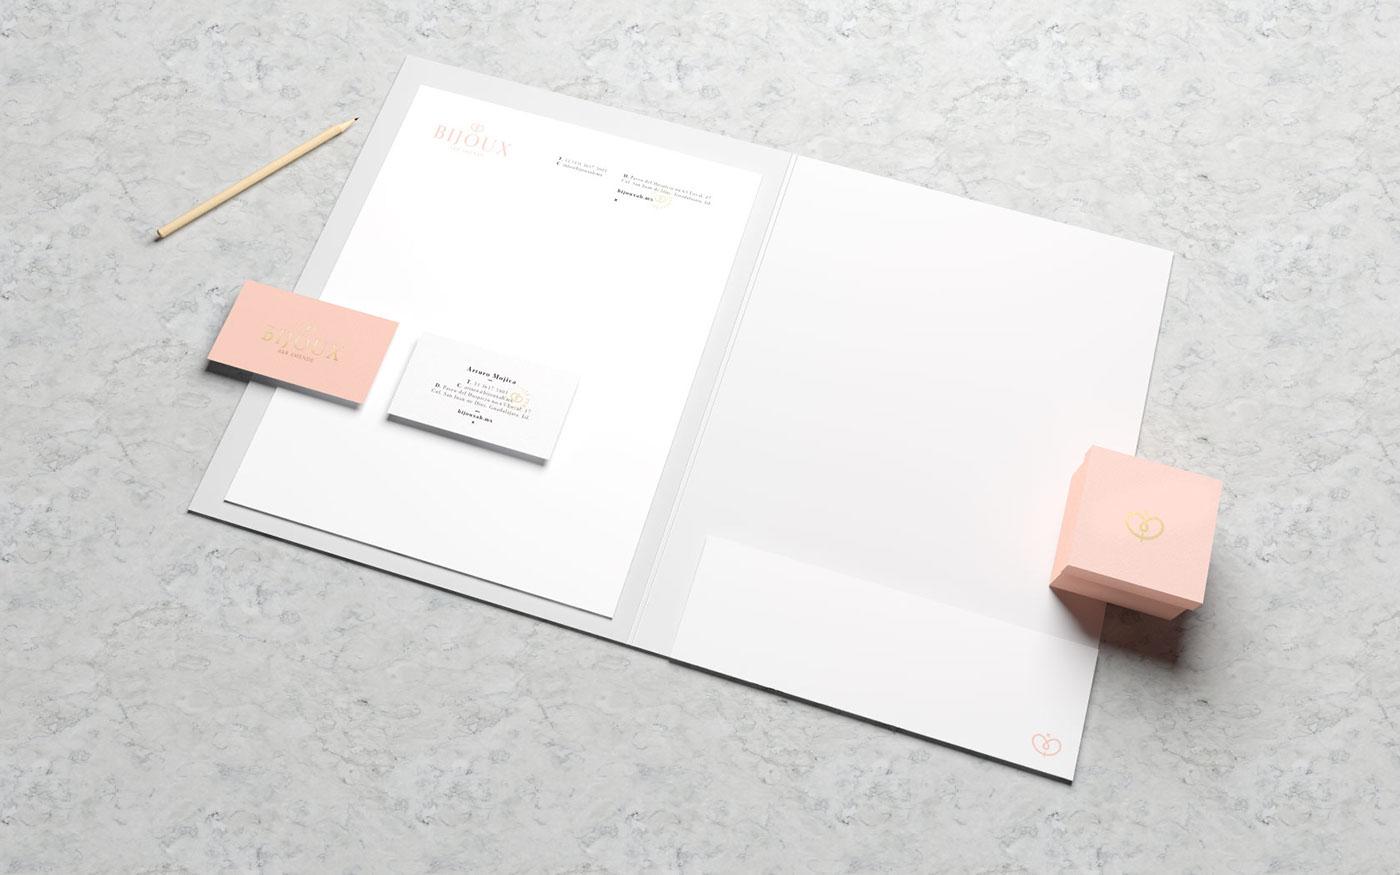 Bijoux珠寶品牌視覺形象設計欣賞-深圳VI設計7